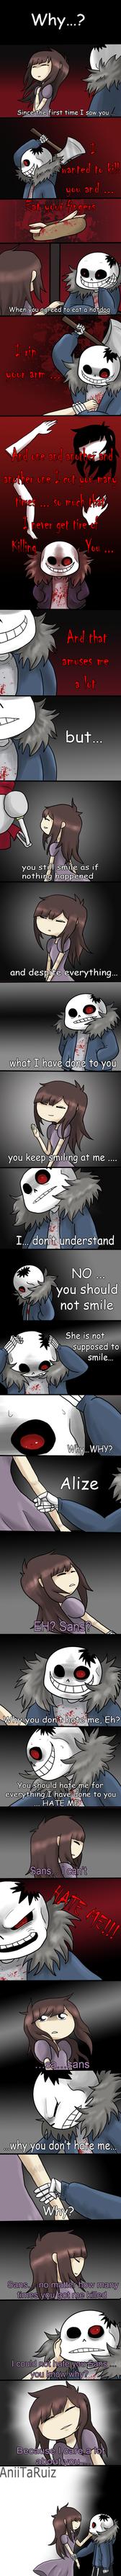 Why do you smile by AniiTaRuiz